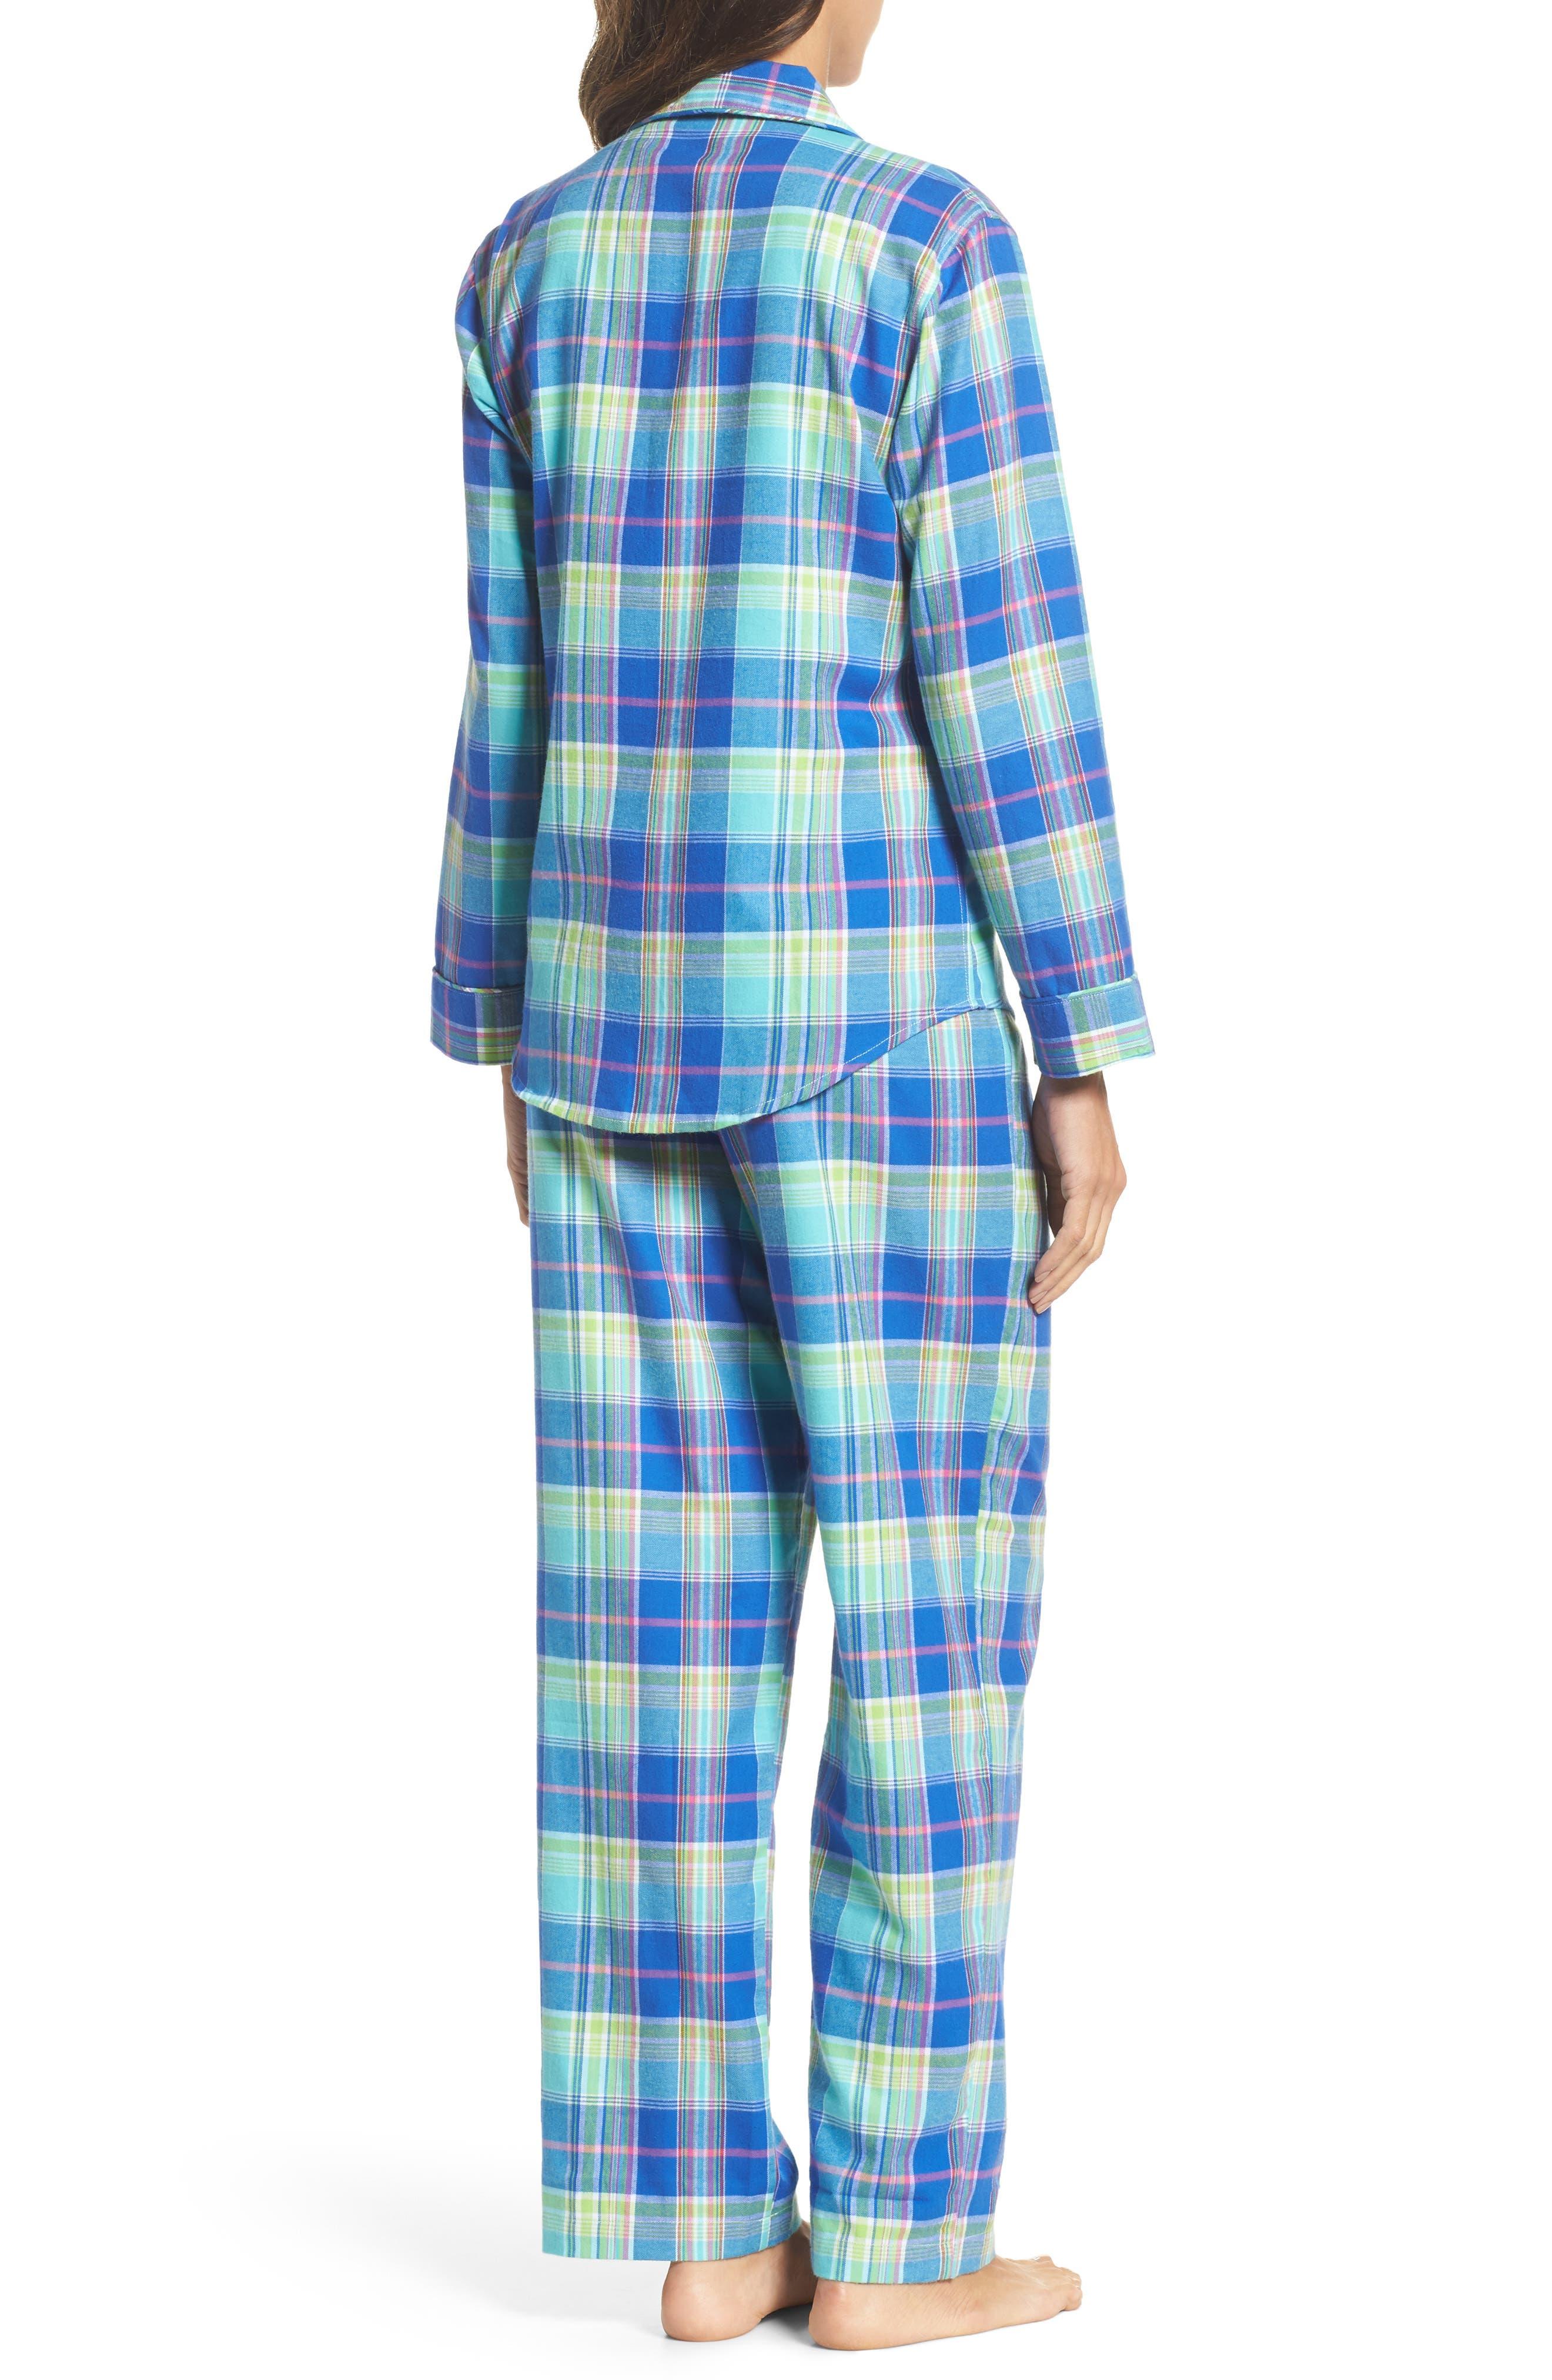 Notch Collar Pajamas,                             Alternate thumbnail 2, color,                             Turquoise Multi Plaid